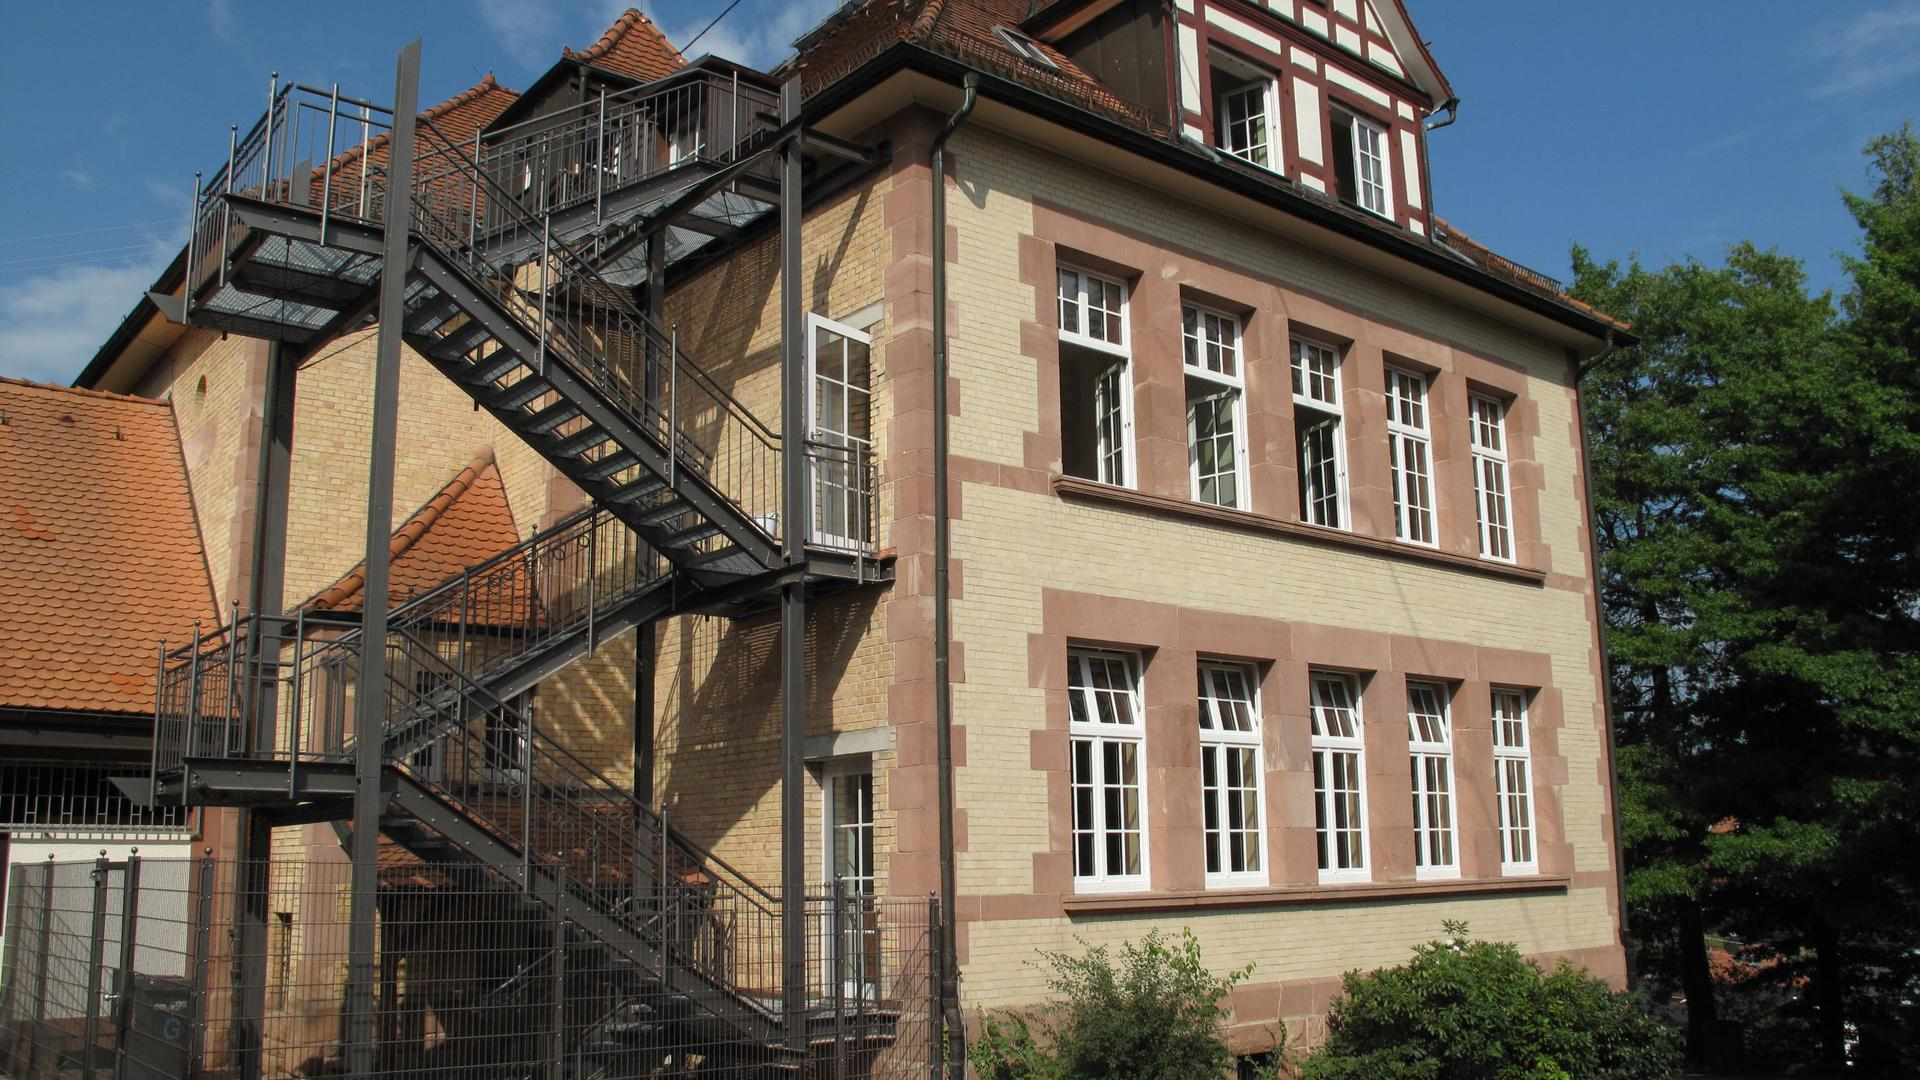 Loffenauer Schule Ostfassade Fluchttreppe Fensteraustausch